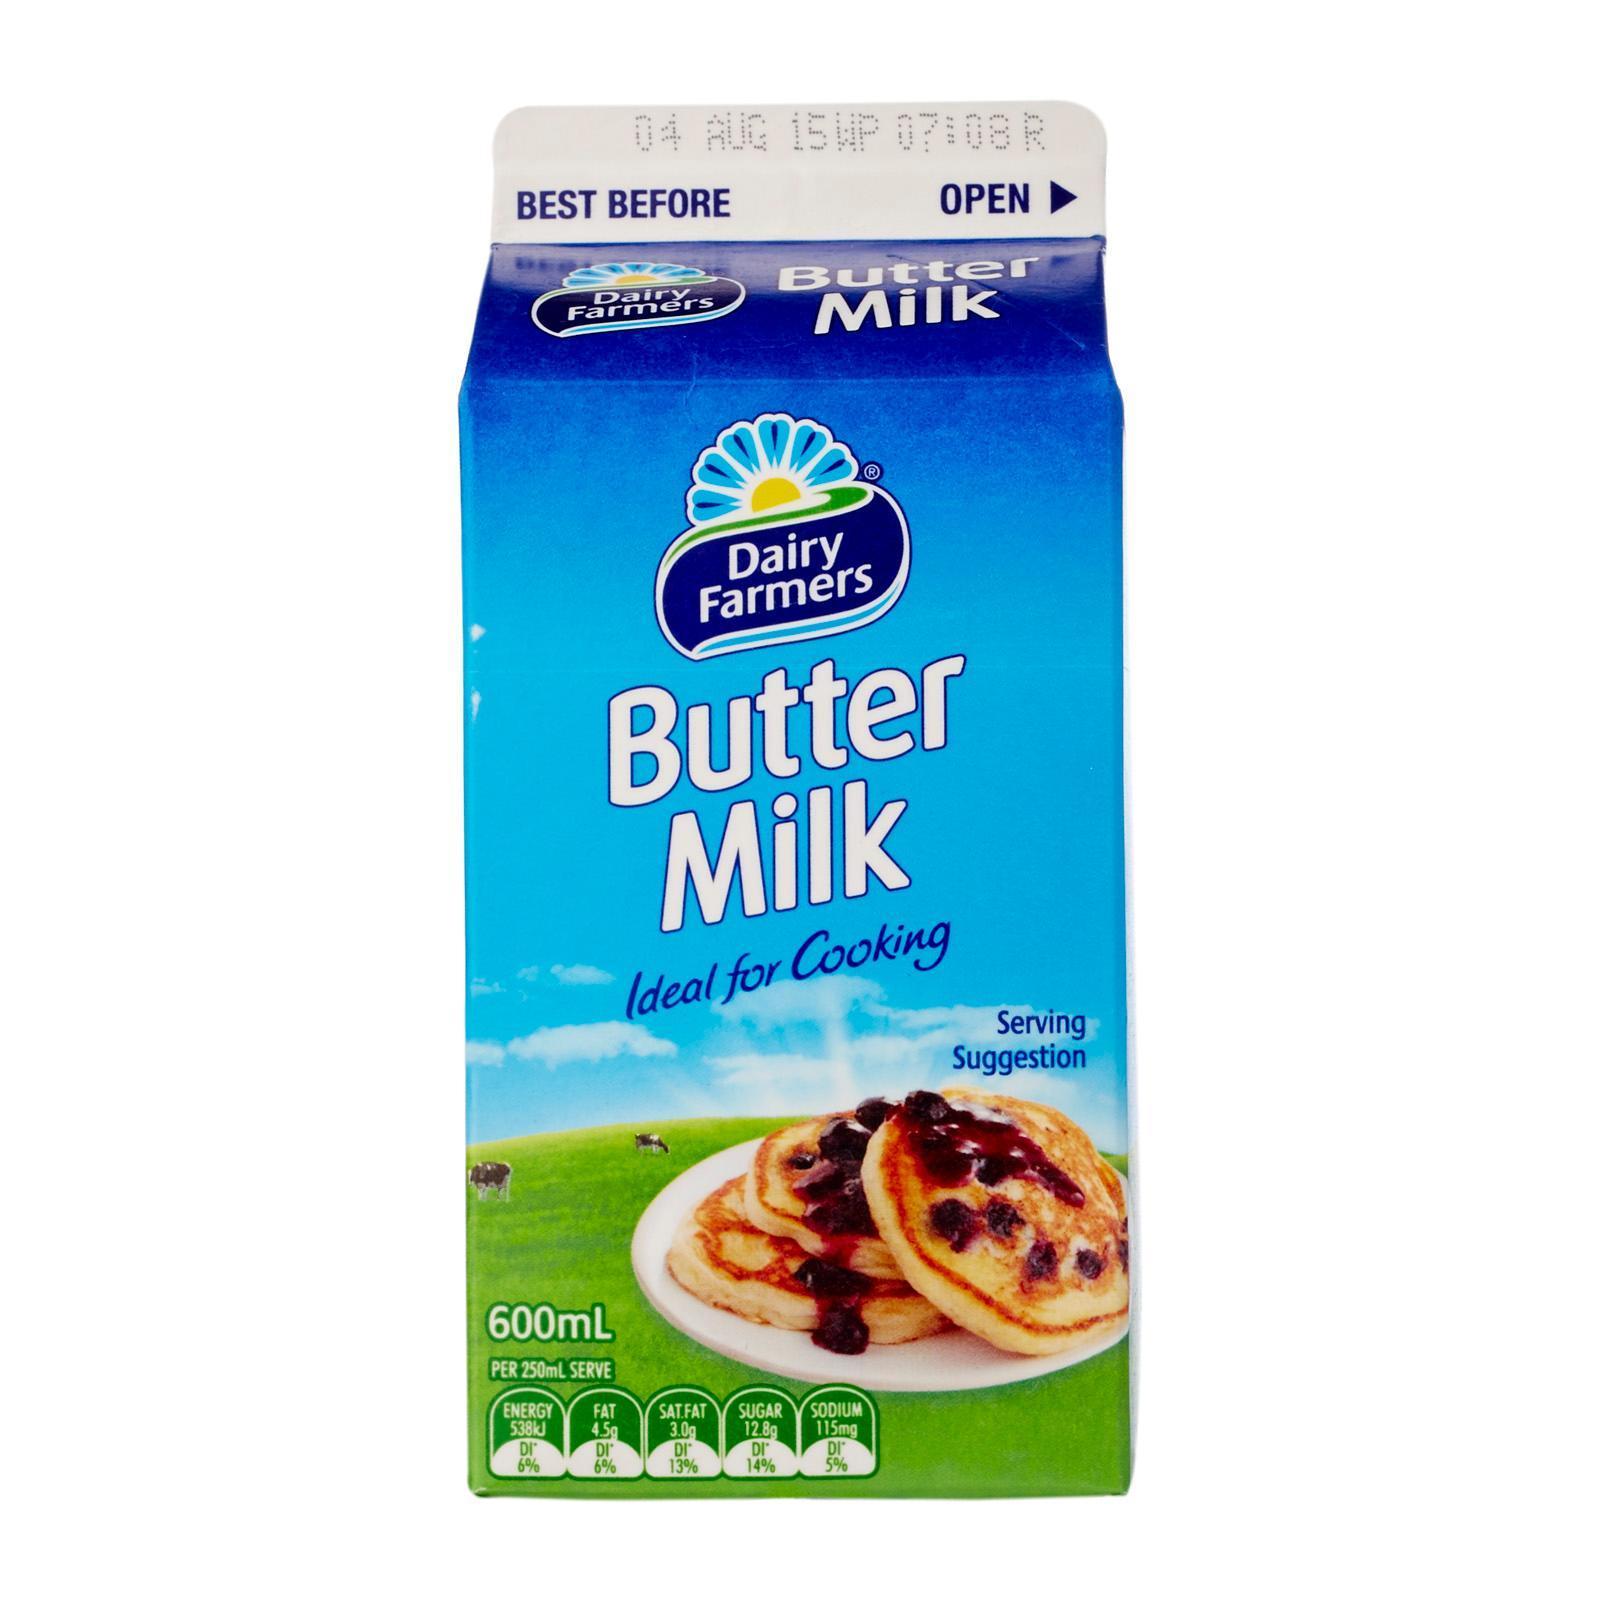 Dairy Farmers Butter Milk By Redmart.